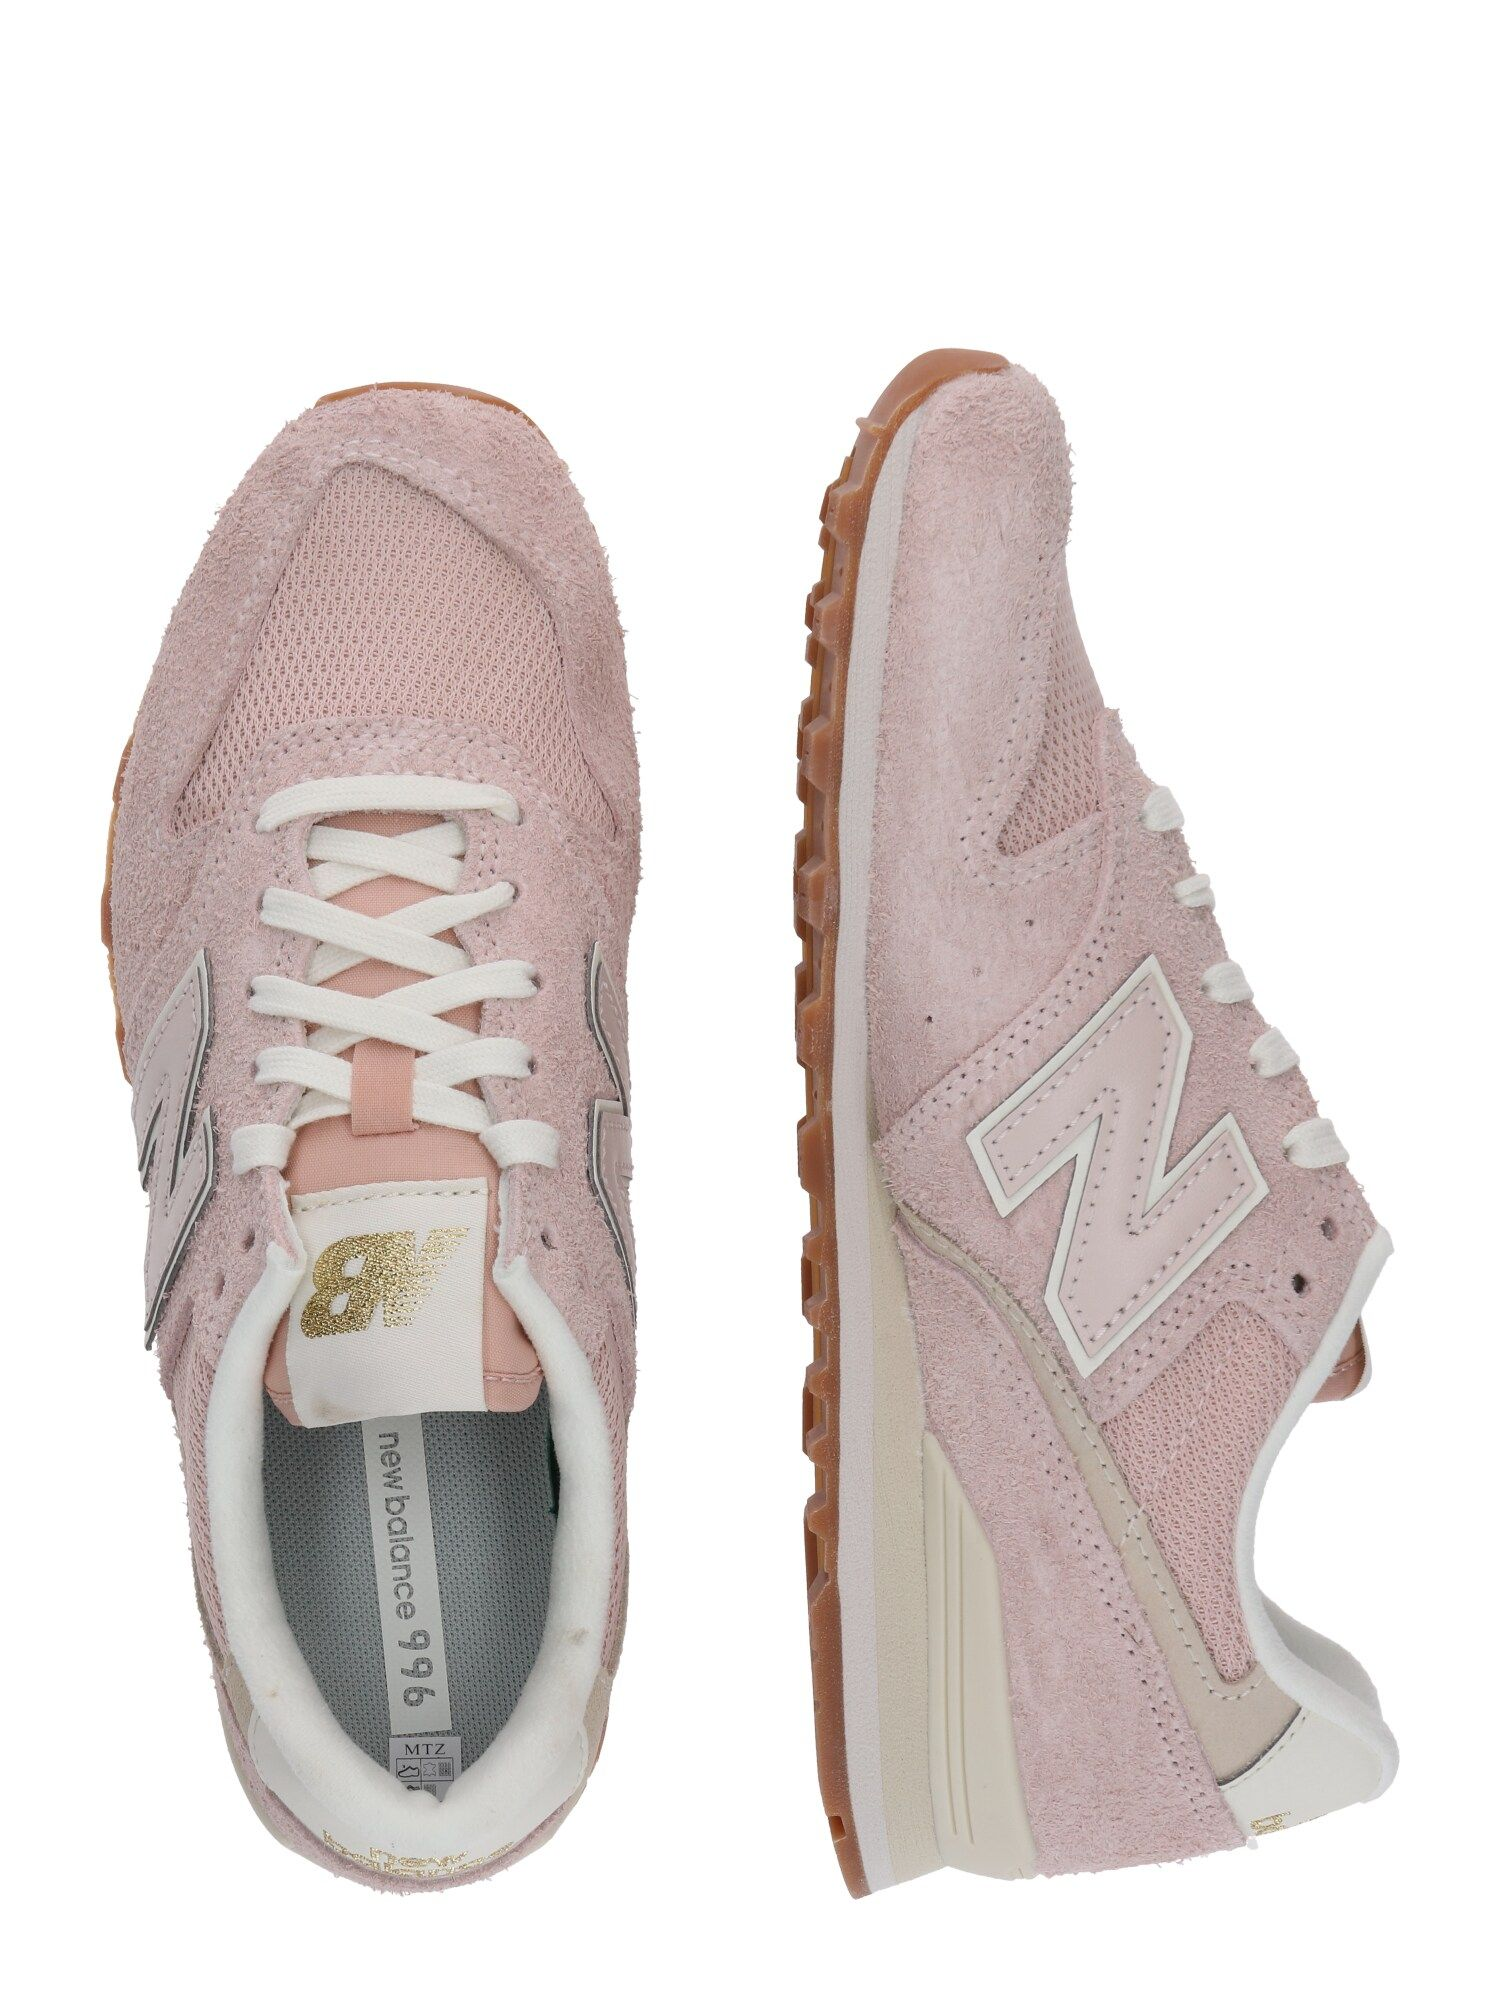 New Balance Sneaker 'WL996 B' Damen, Rosa / Beige, Größe 39 ...